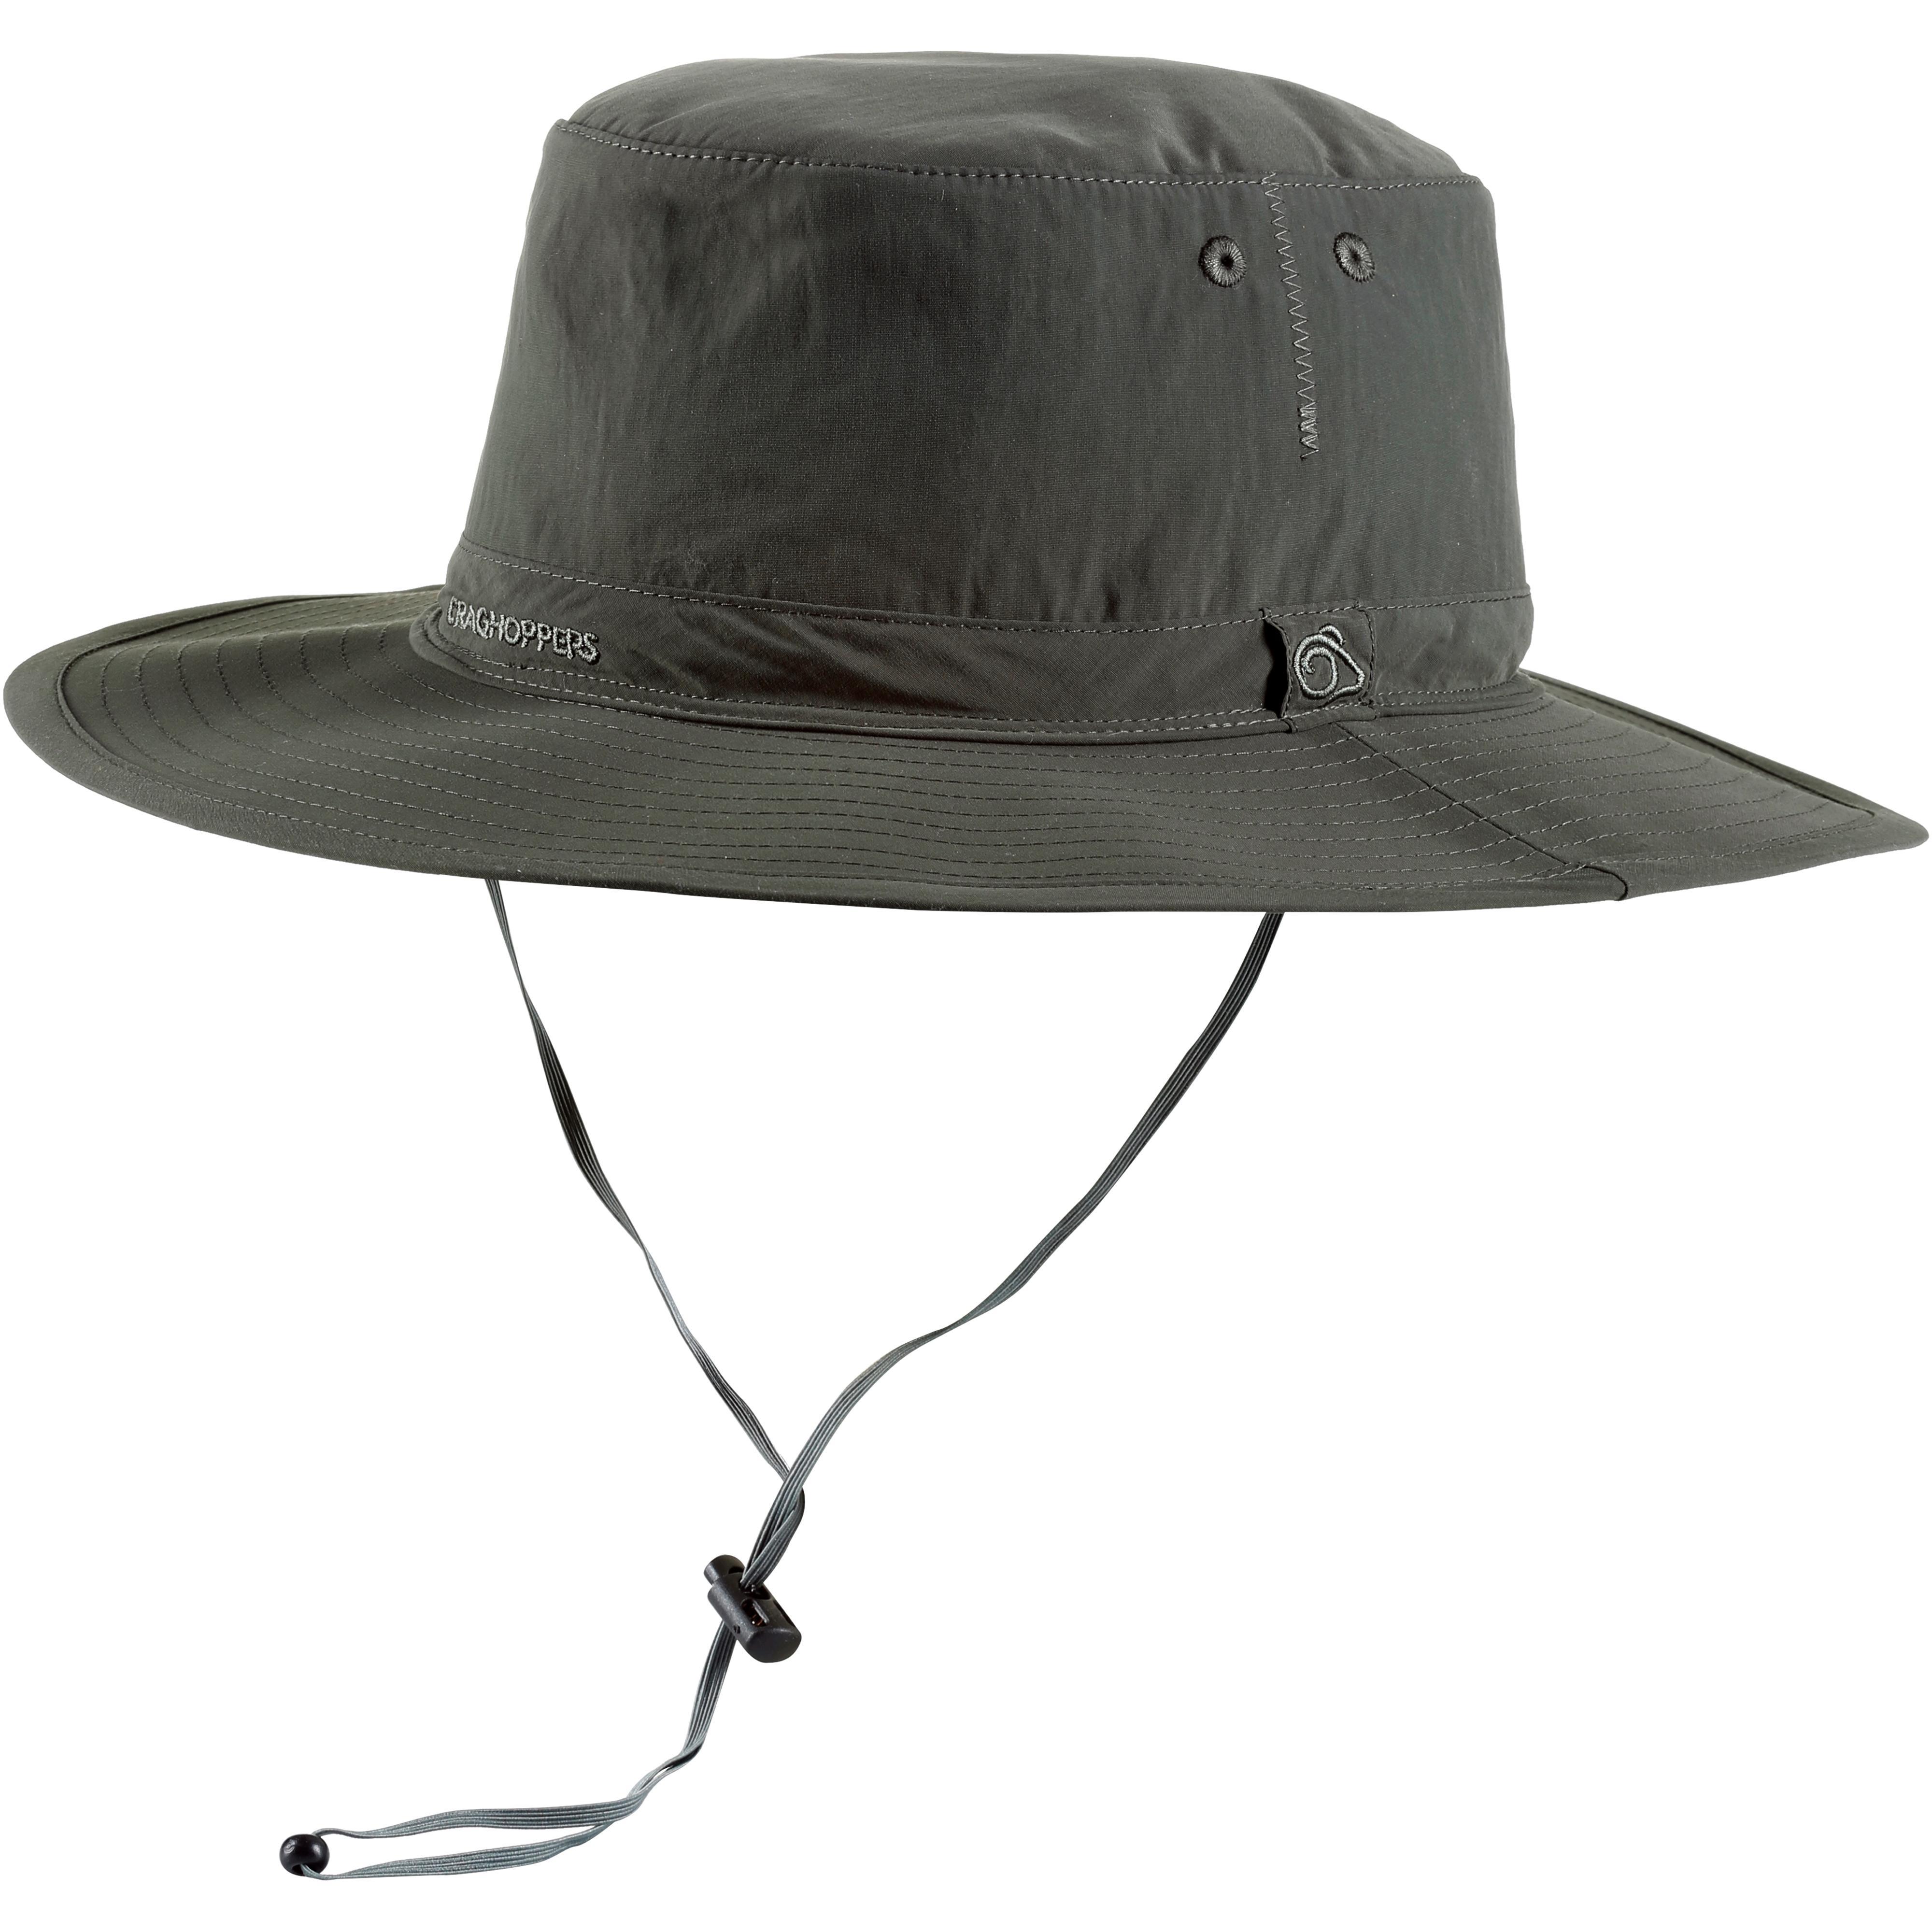 h�te online kaufen sonnen \u0026 trekkingh�te bei sportscheck  craghoppers nosilife outback hut herren dark khaki